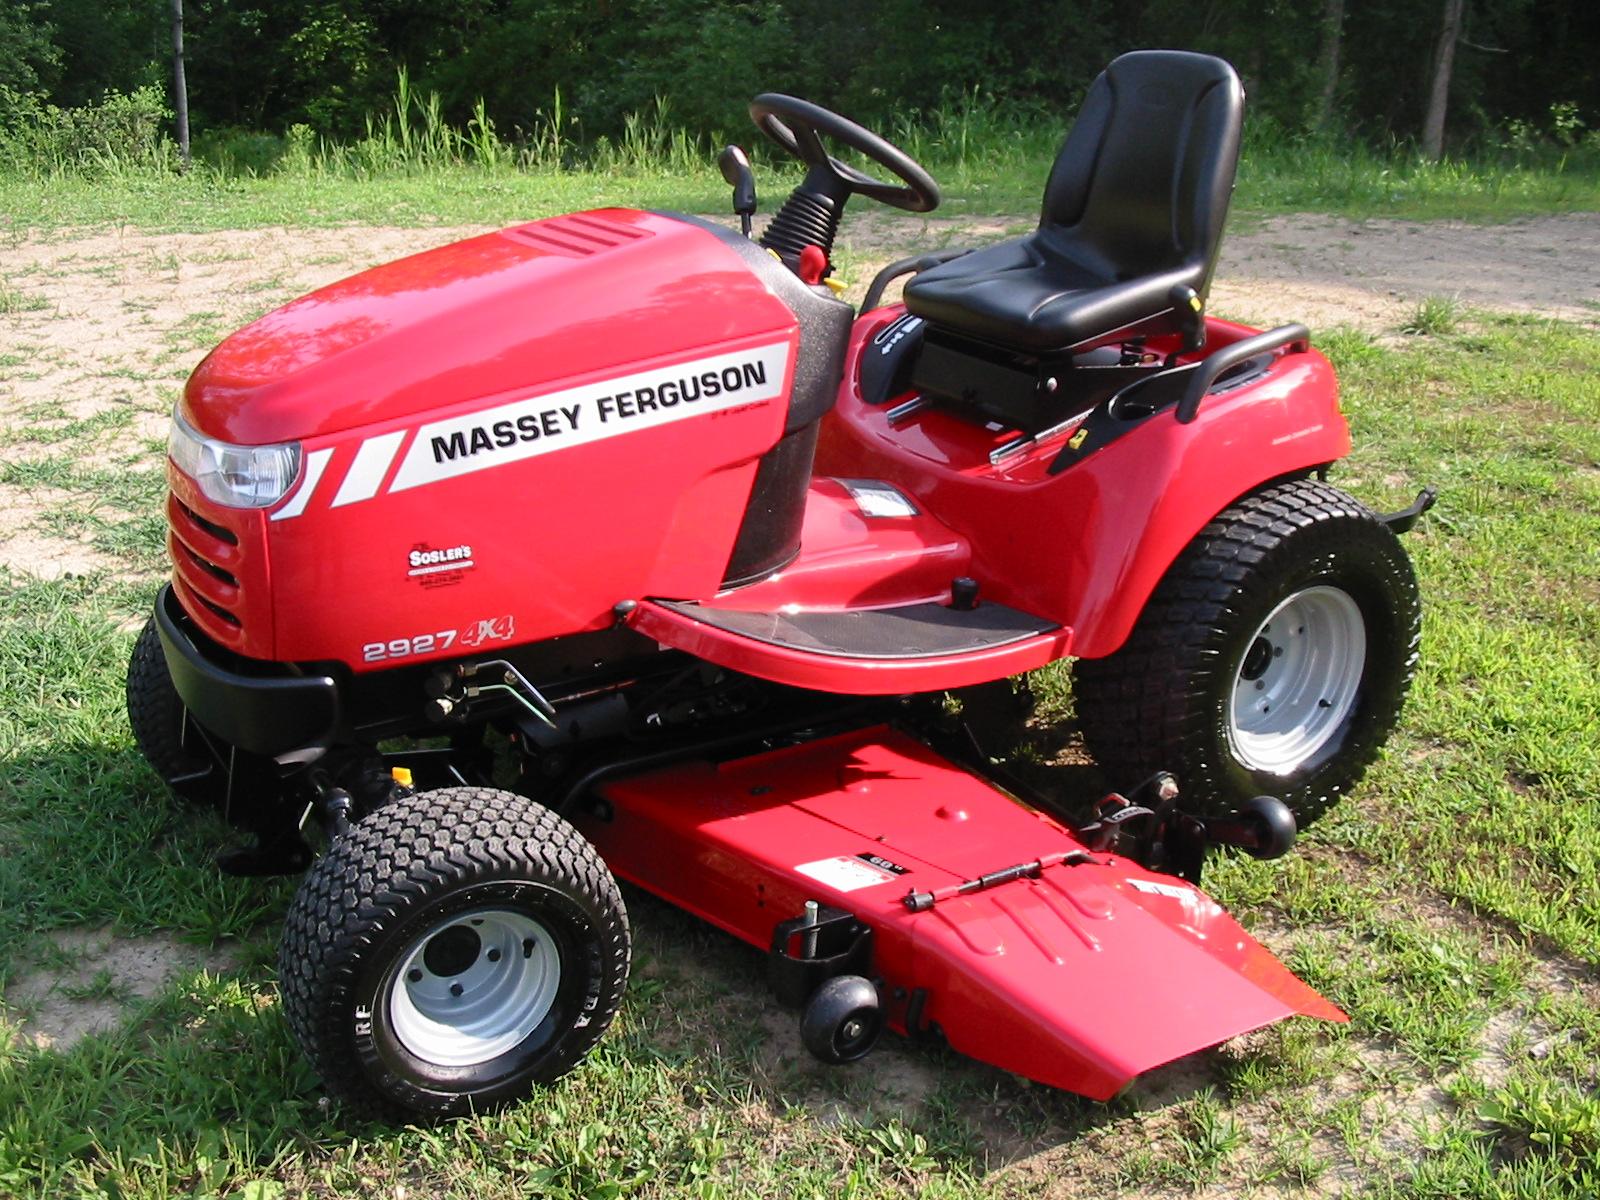 Marvelous 2011 Massey Ferguson 2927H Garden Tractor Awesome Design